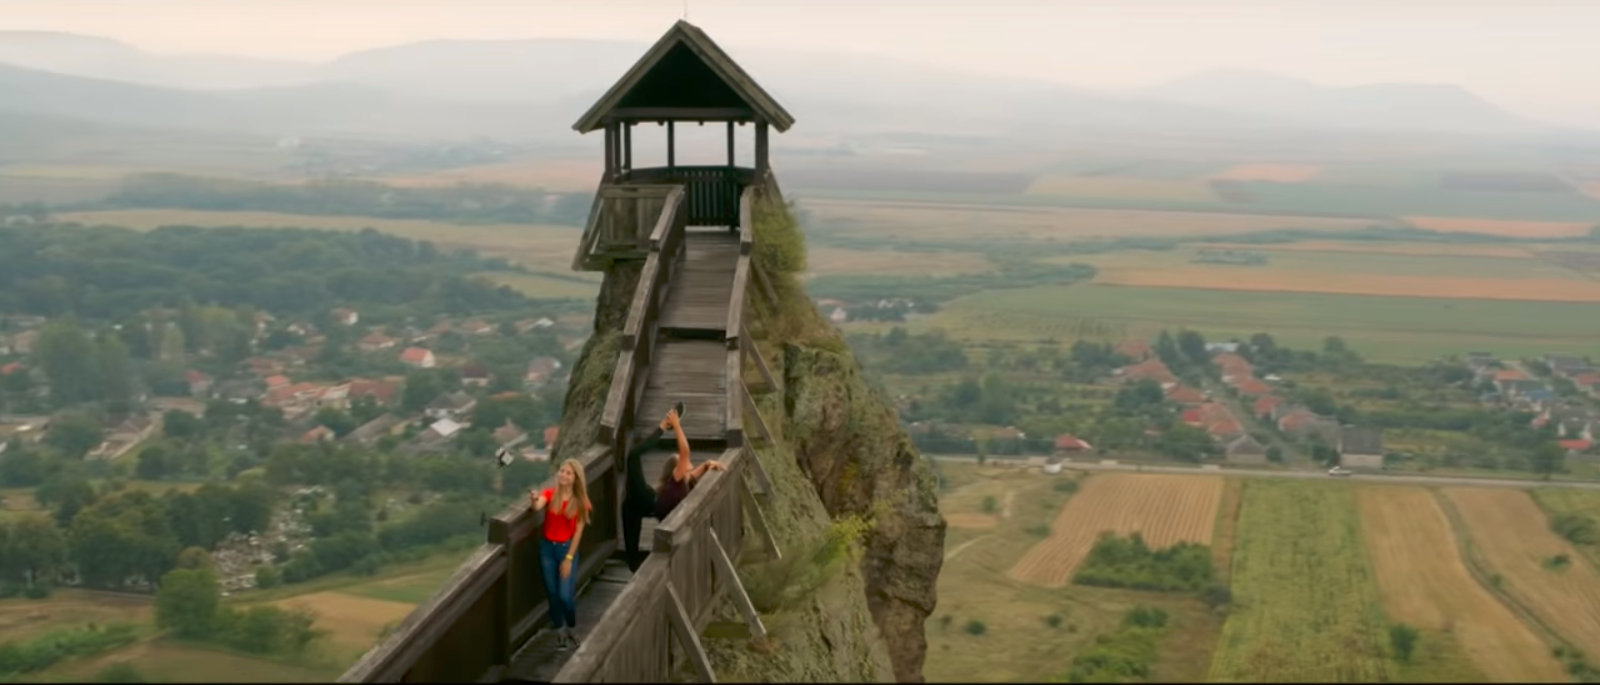 Wow Hungary! Warum liebt man Ungarn? post's picture